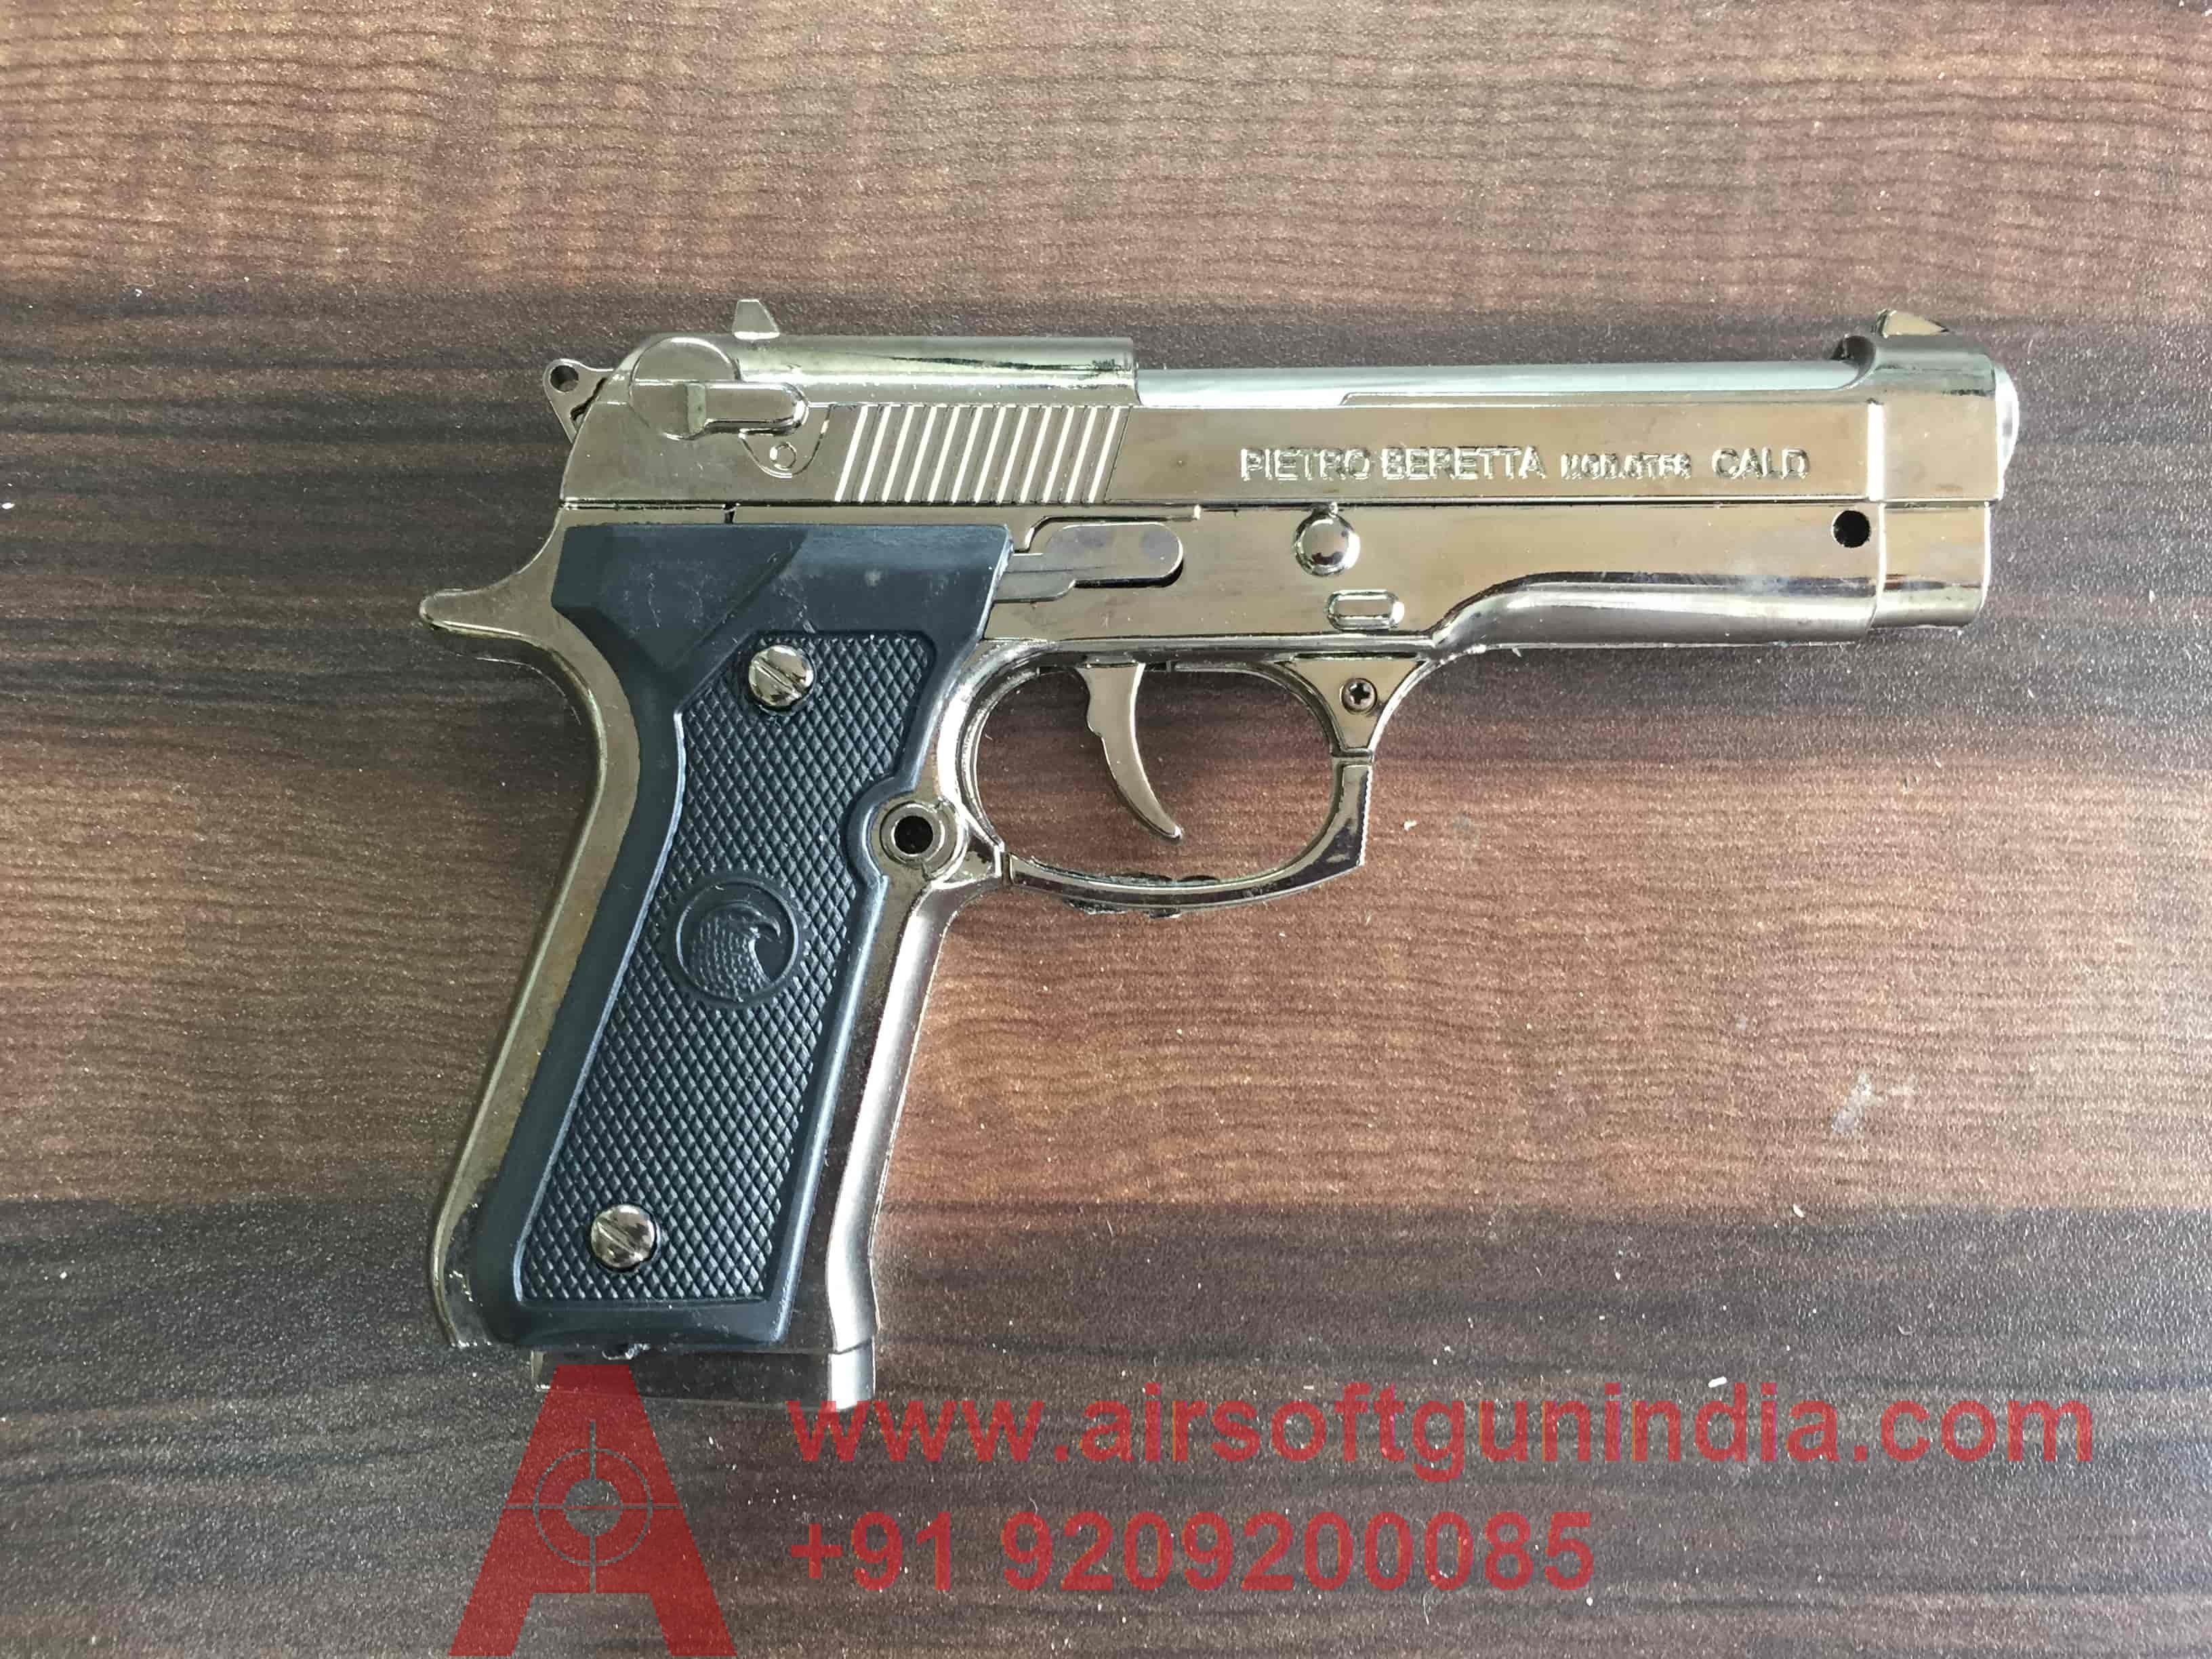 Beretta M9 Compact Lighter By Airsoft Gun India